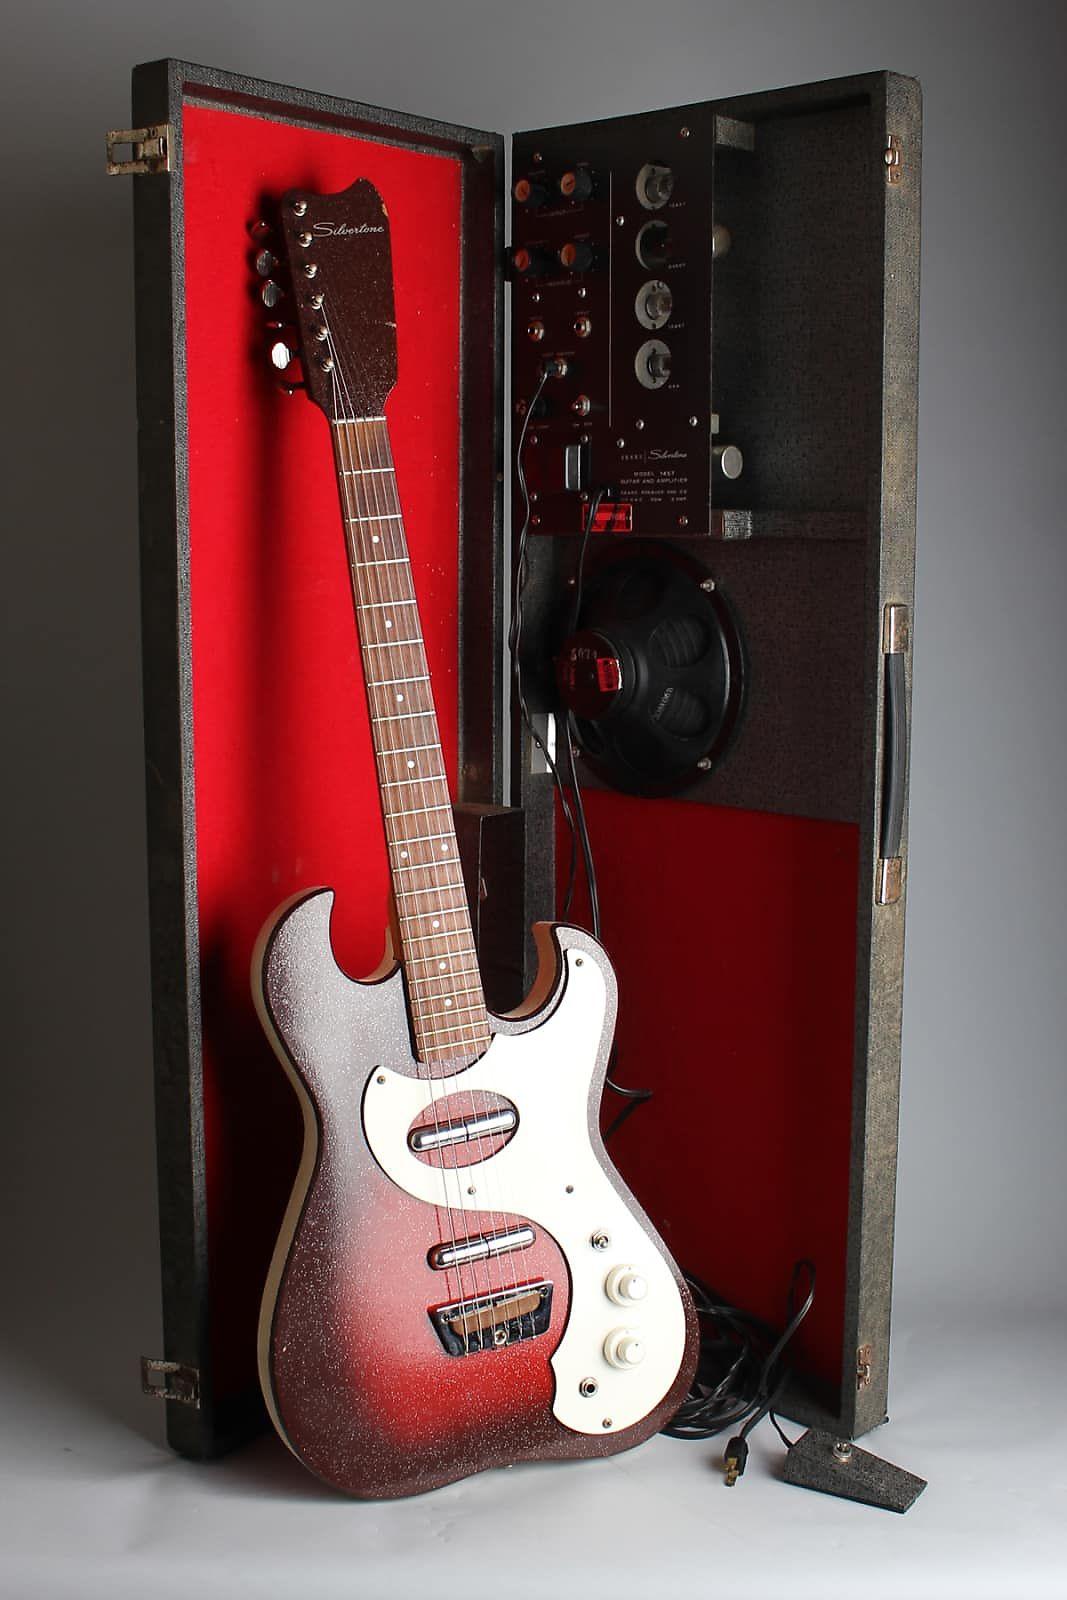 Silvertone Model 1457 Amp-In-Case Semi-Hollow Body Electric Guitar,  made by Danelectro (1964), ser. #5074, original black hard shell case.